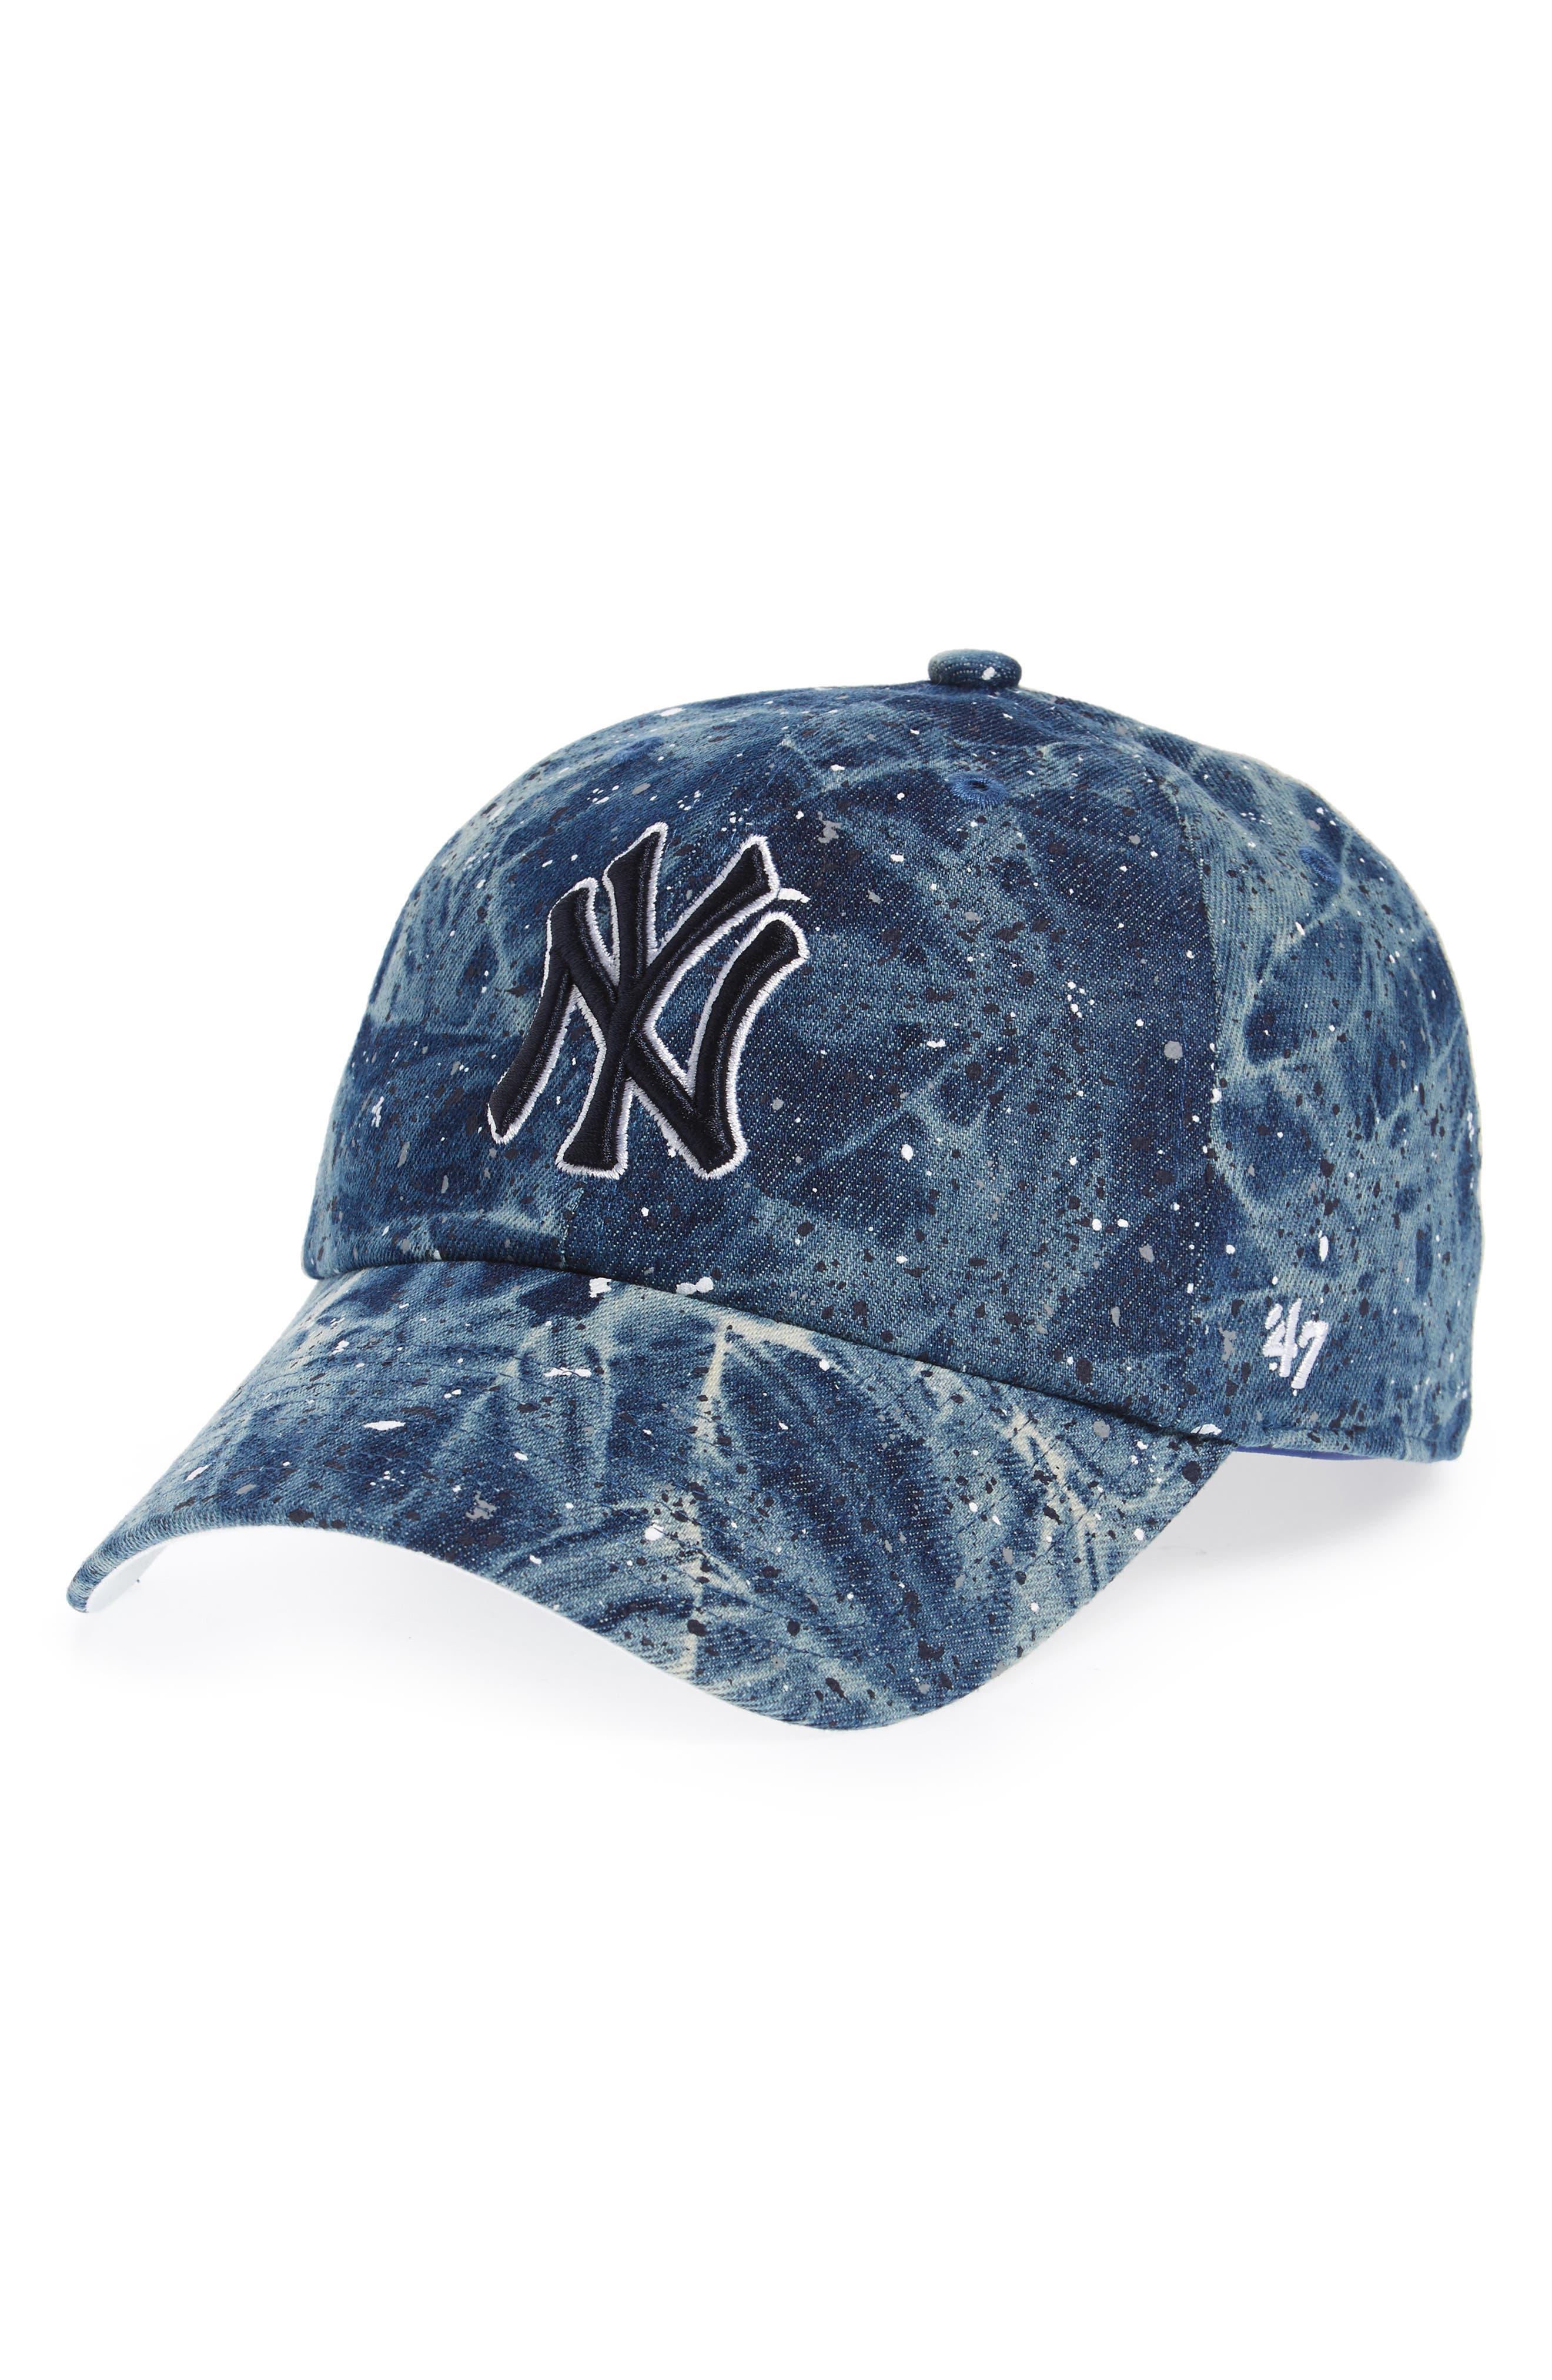 New York Yankees - Blue Splatter Baseball Cap,                         Main,                         color, 400